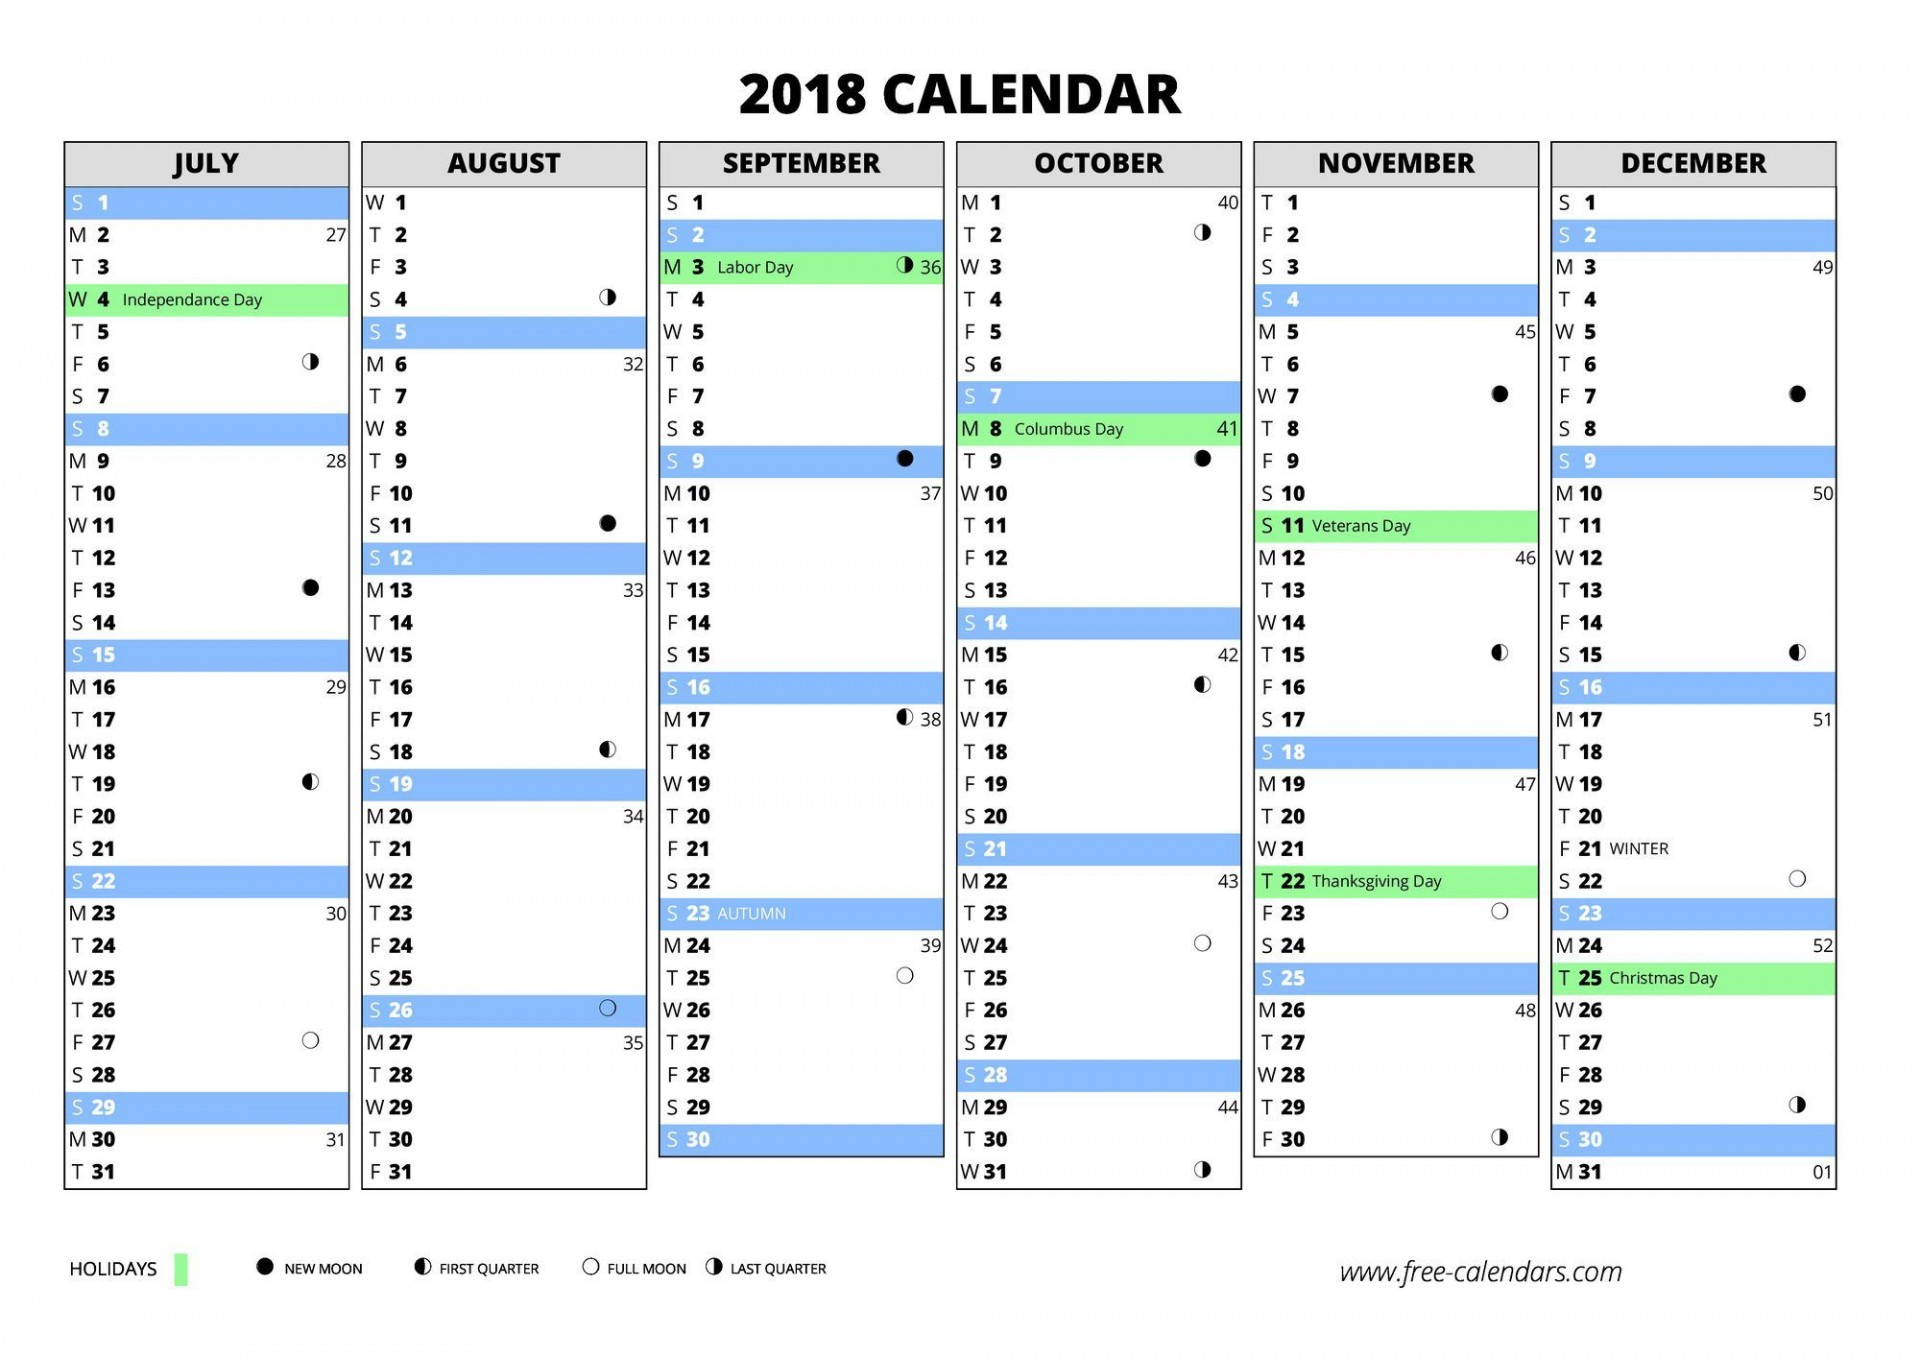 005 Fascinating Free Printable Weekly Calendar Template 2018 Design 1920